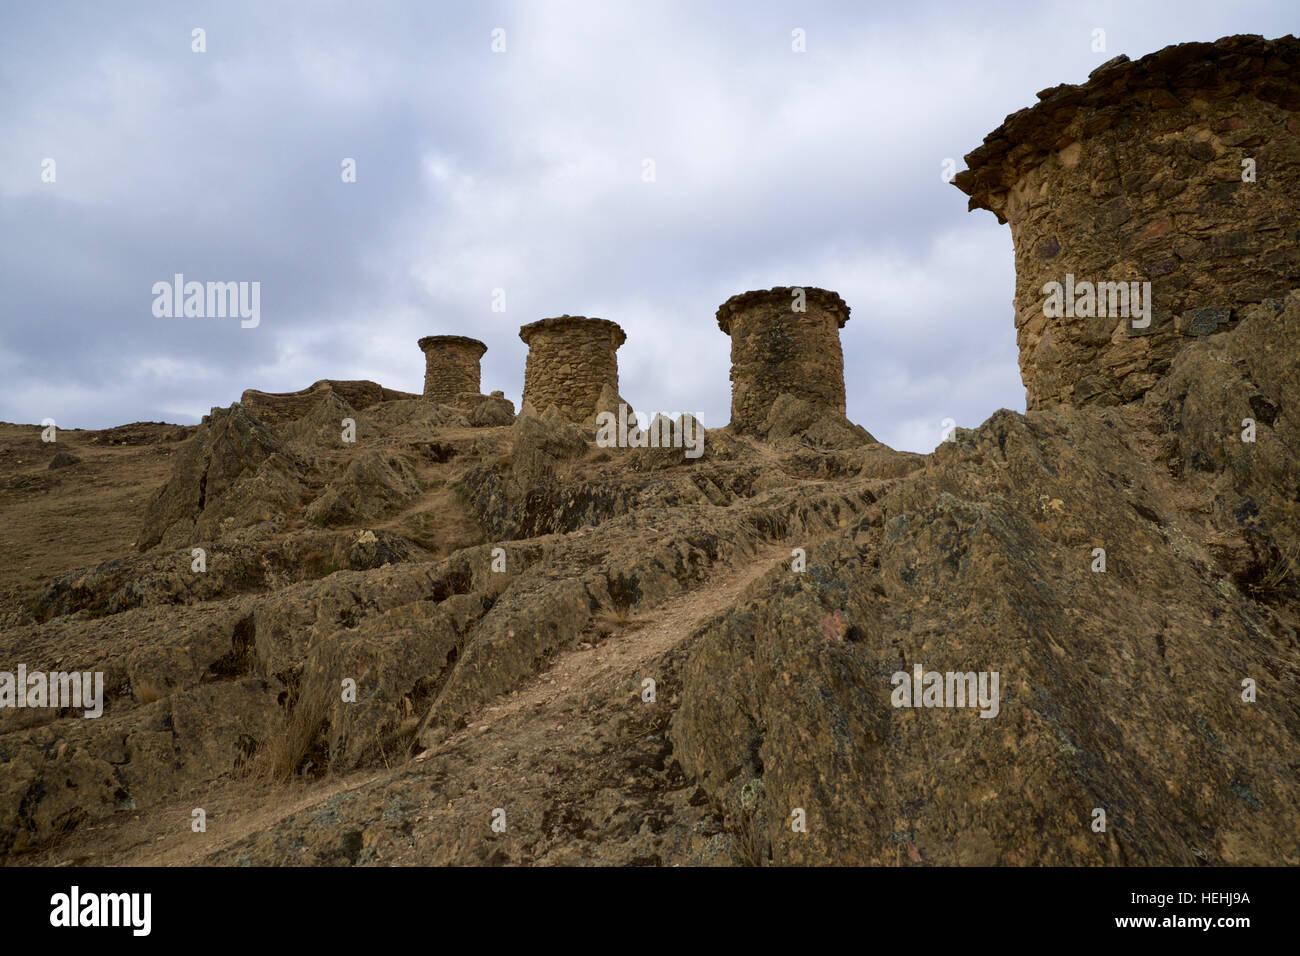 Chullpas of Ninamarca - Lupaca burial chambers     Chullpas of Ninamarca. 30 kms of Cuzco to Manu National Park. - Stock Image